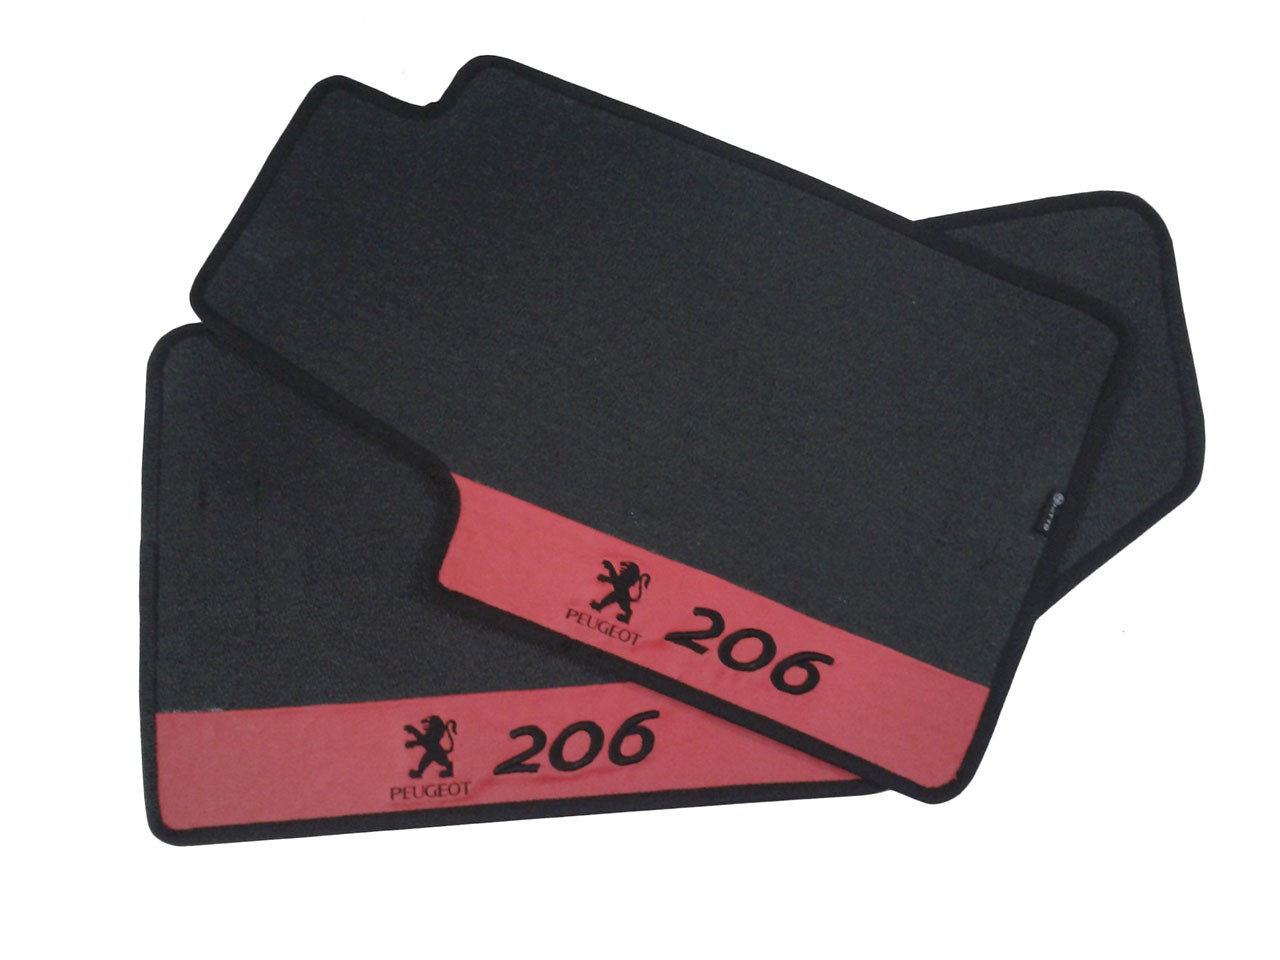 Tapete Peugeot 206 Carpete Luxo Base Pinada